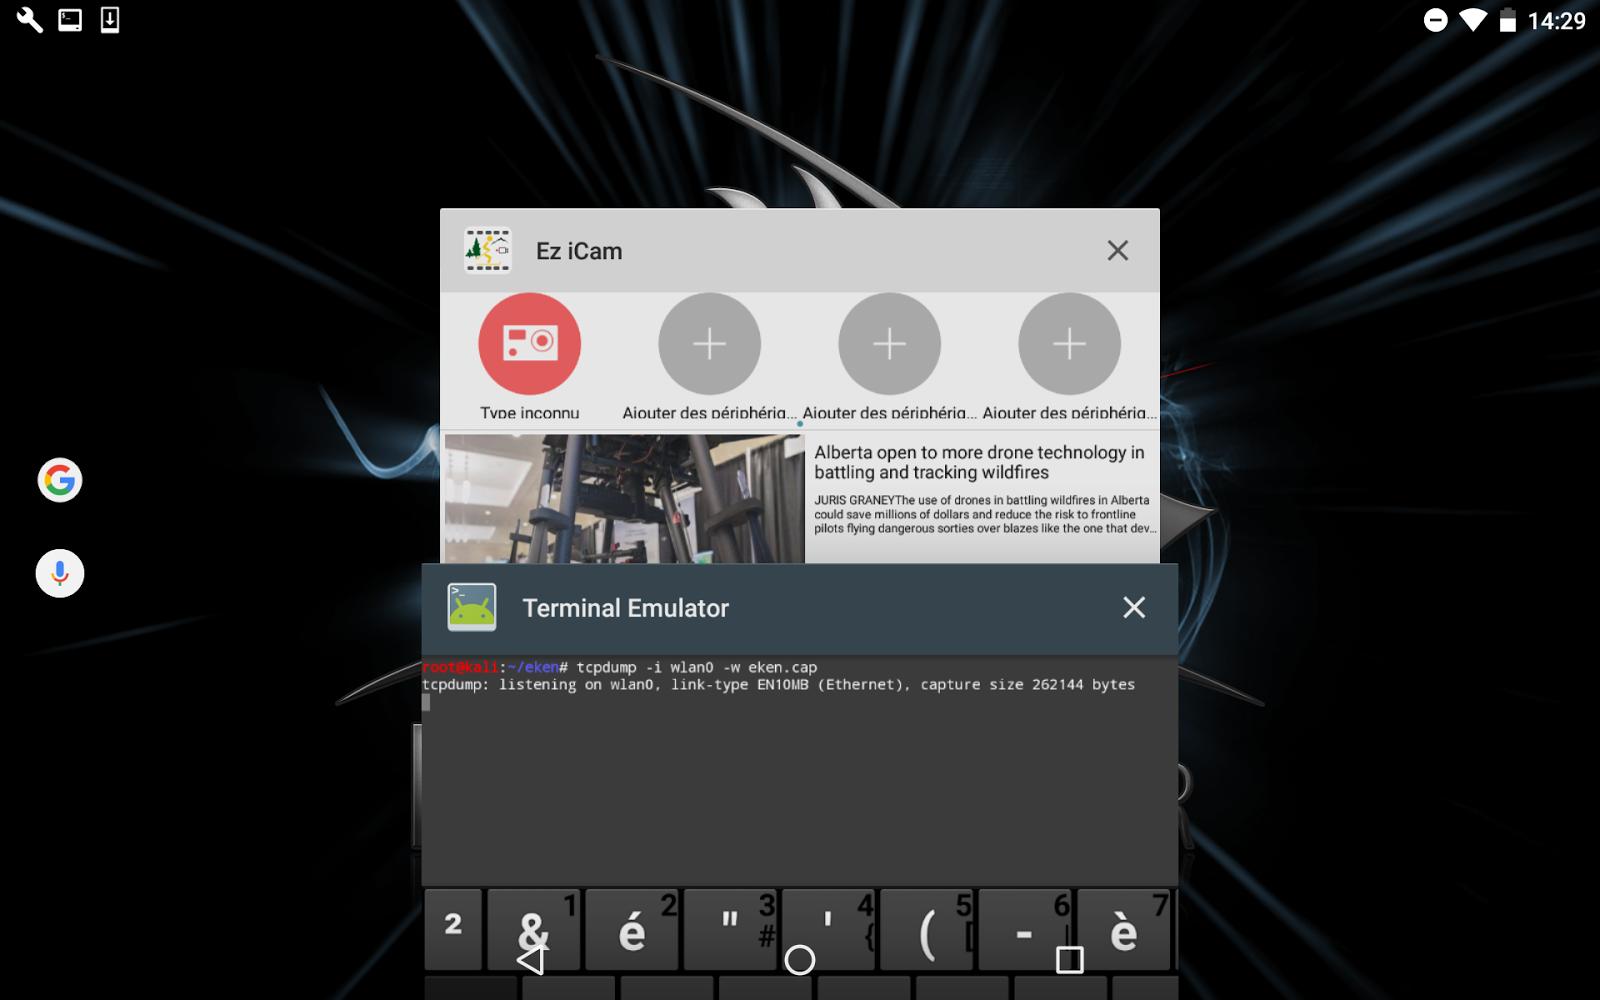 Hacken: Reverse engineering the Eken Android App: Part 1